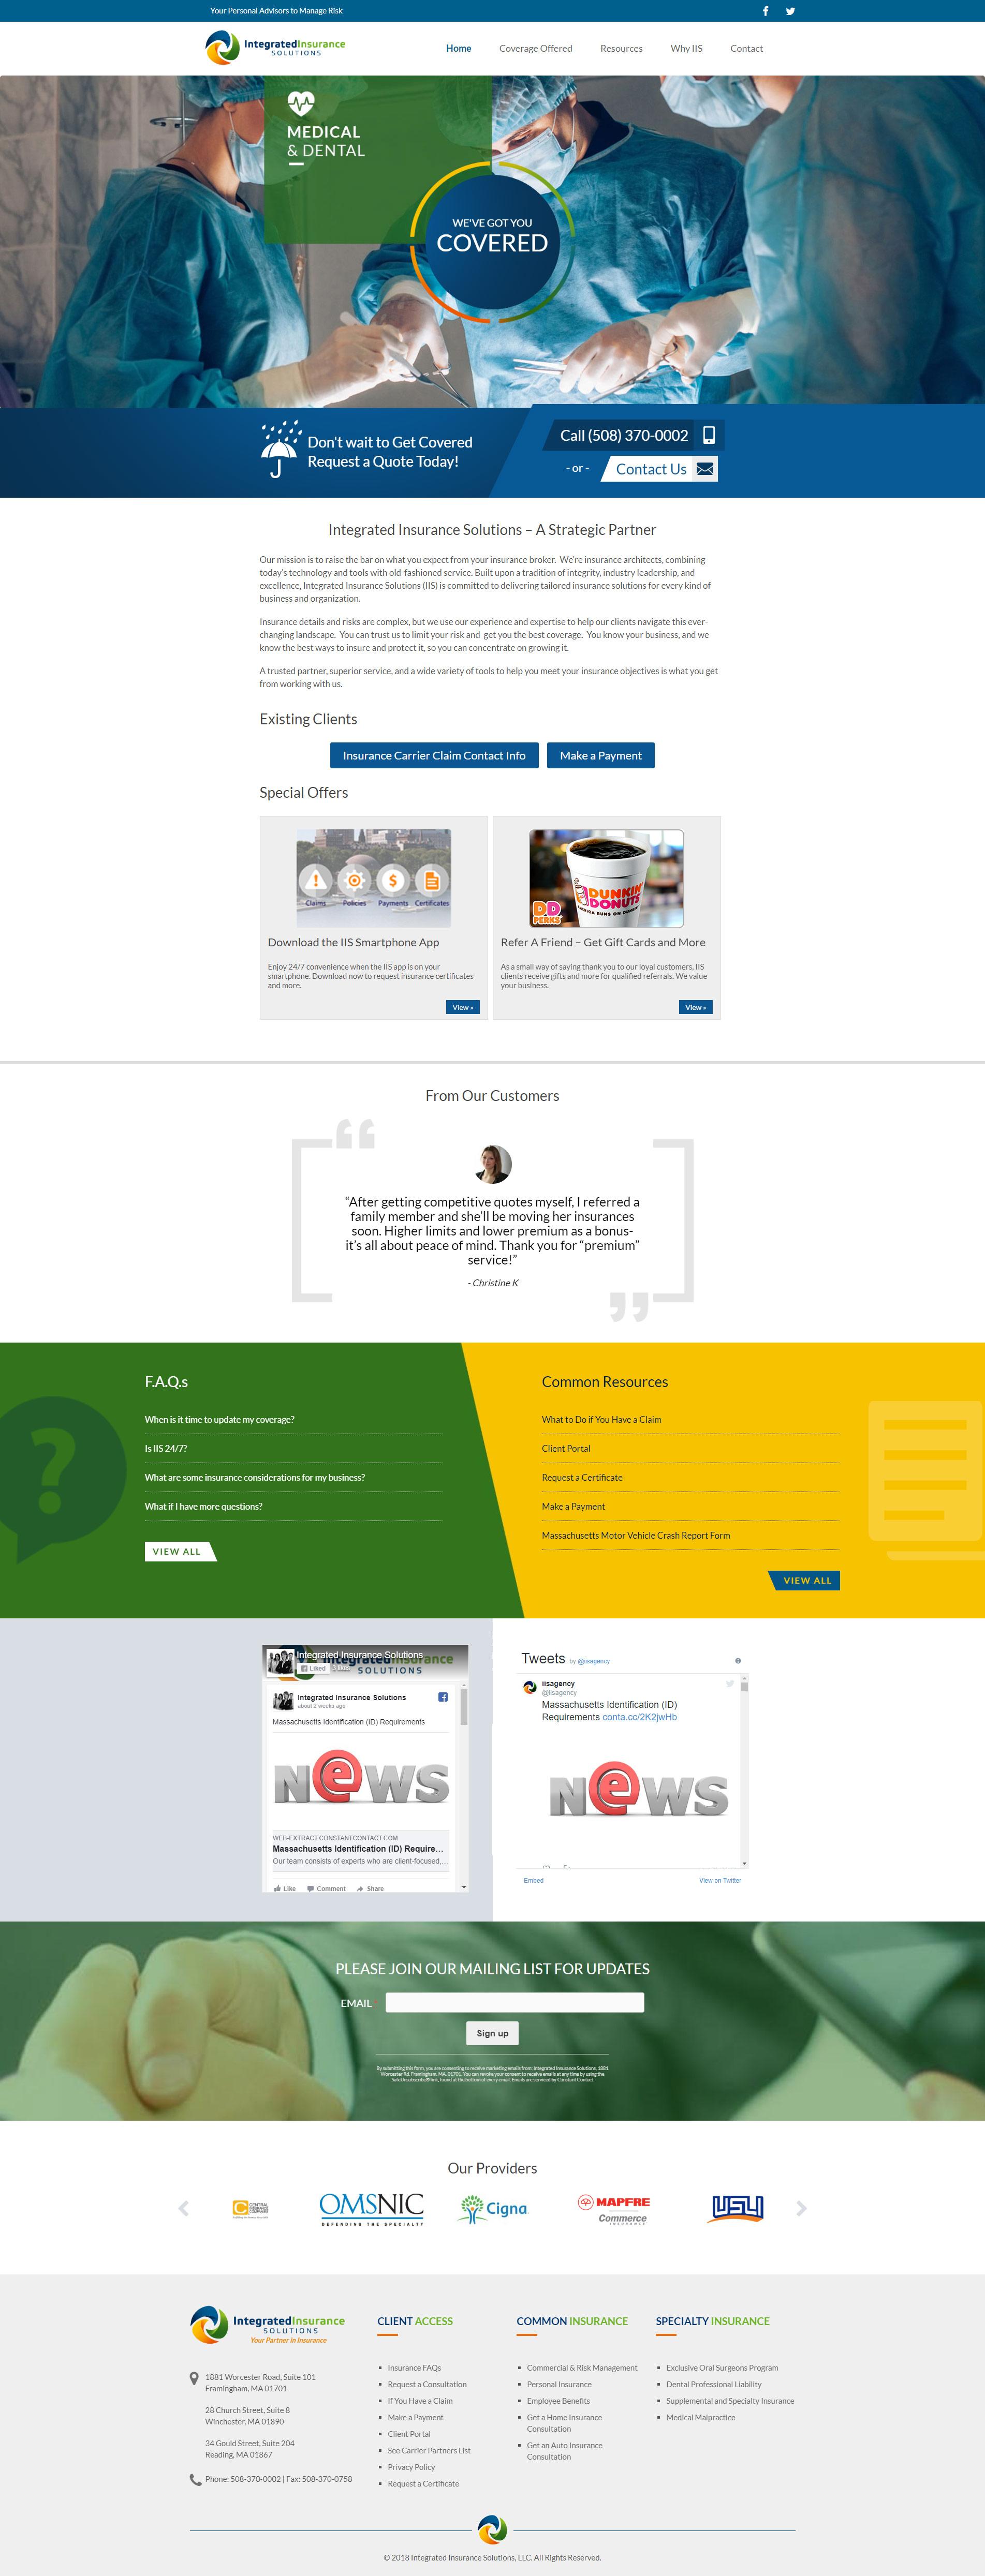 Welcome to StellarWebStudios com - Web Design and